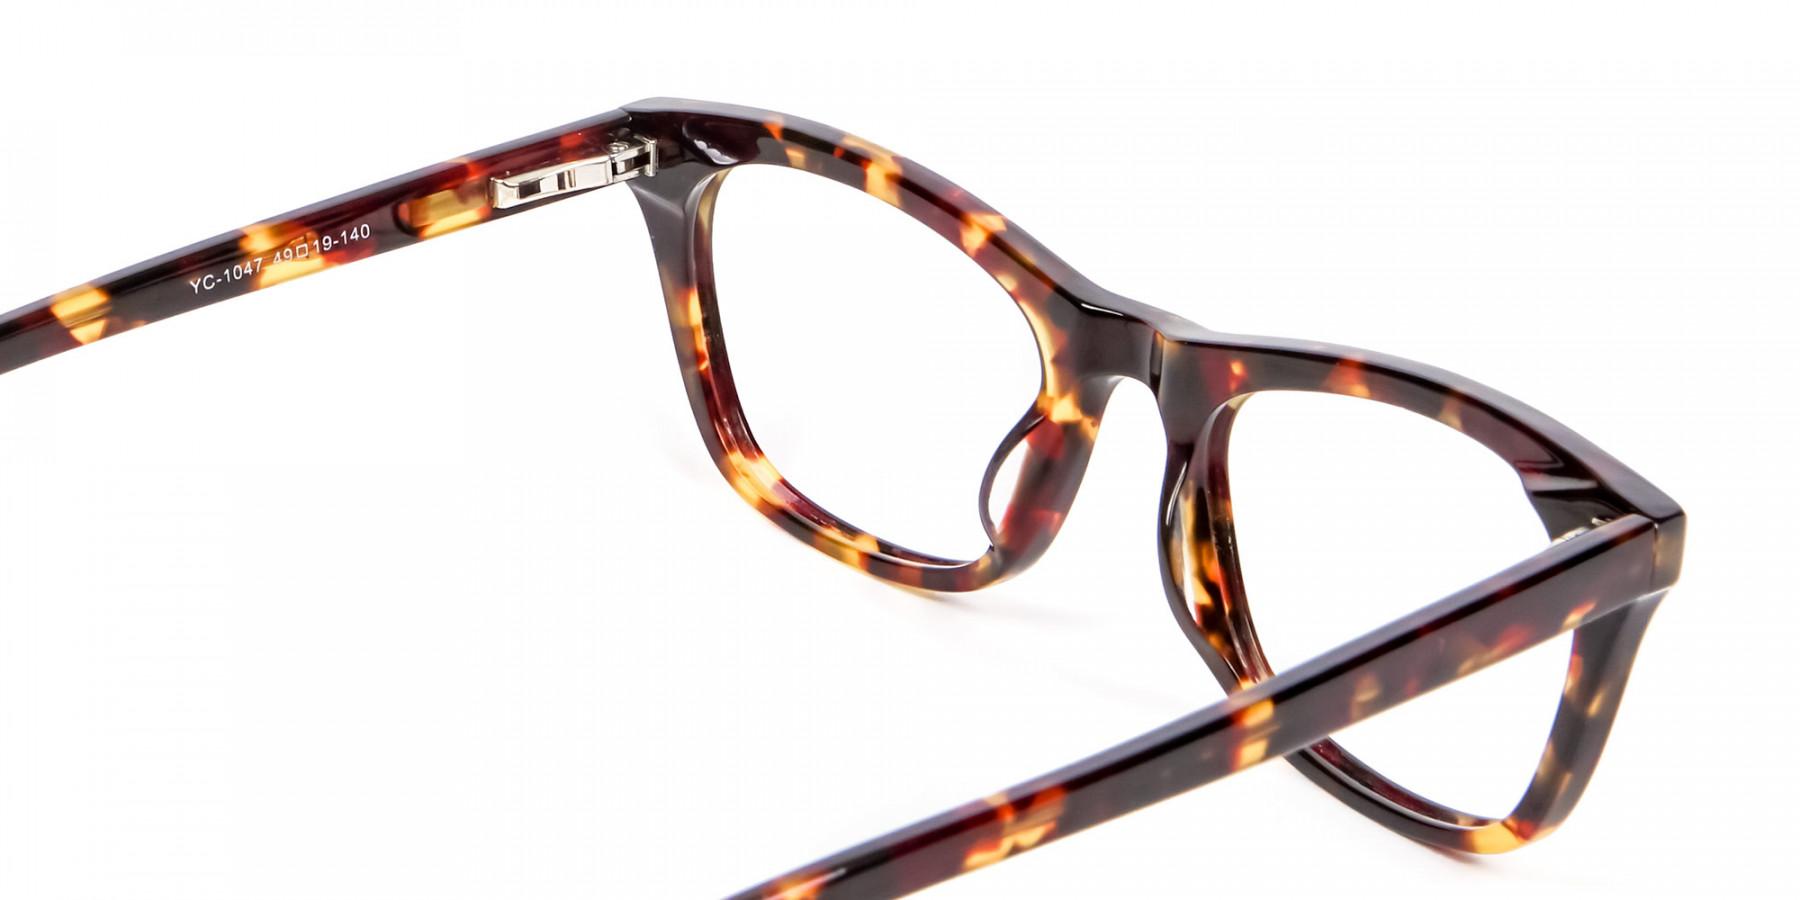 Warm-toned Tortoiseshell Glasses in Cat Eye Style